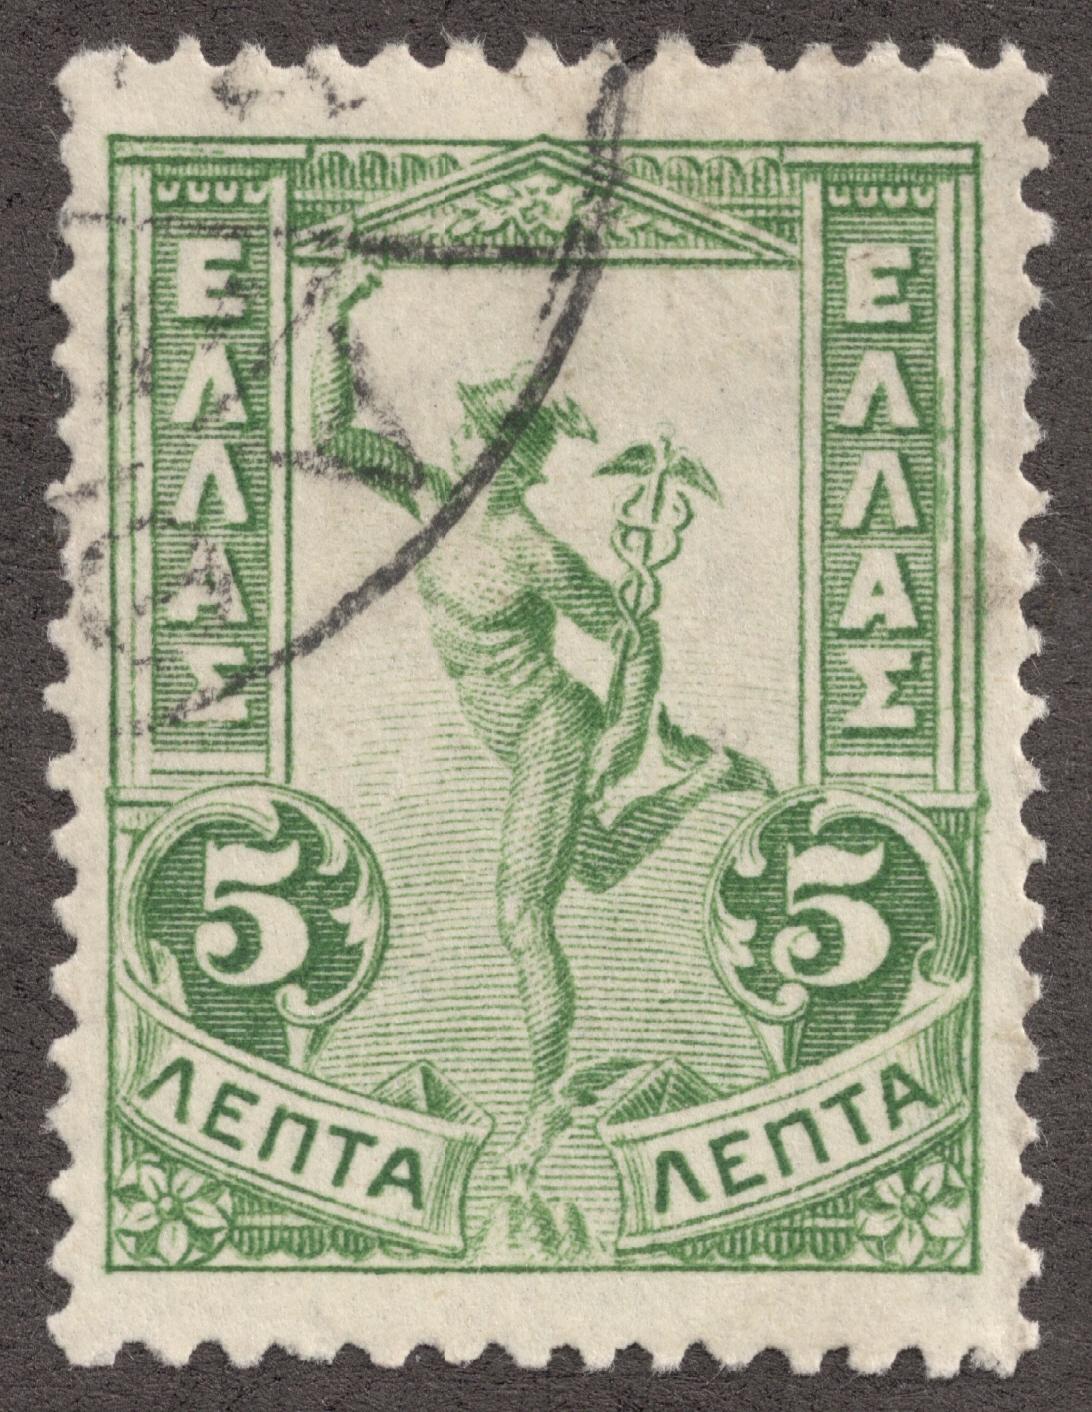 Scott stamp catalogue